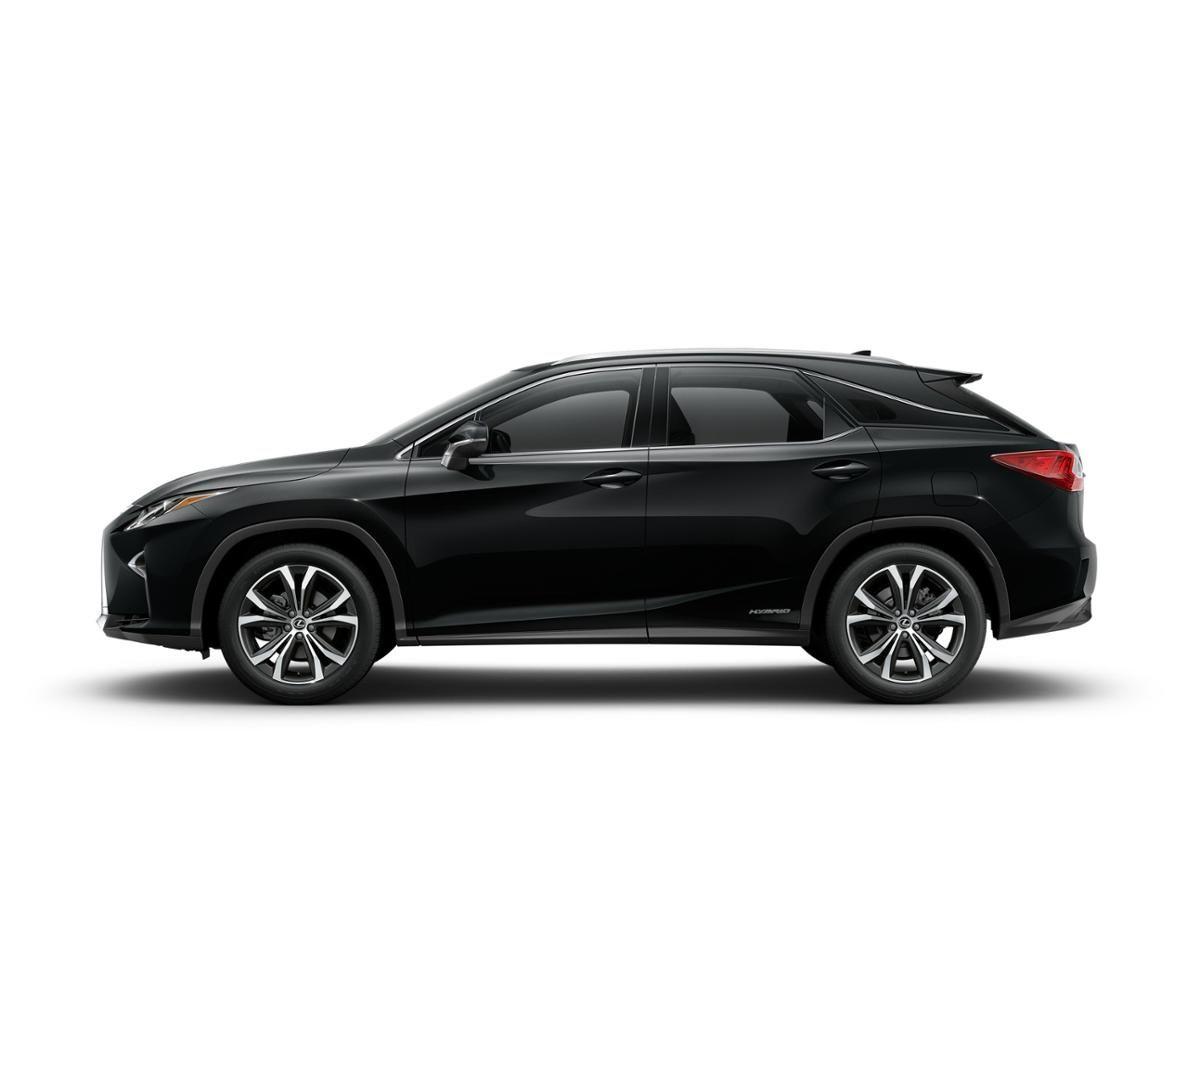 2019 Lexus Rx 450h For Sale In Portland Em 2020